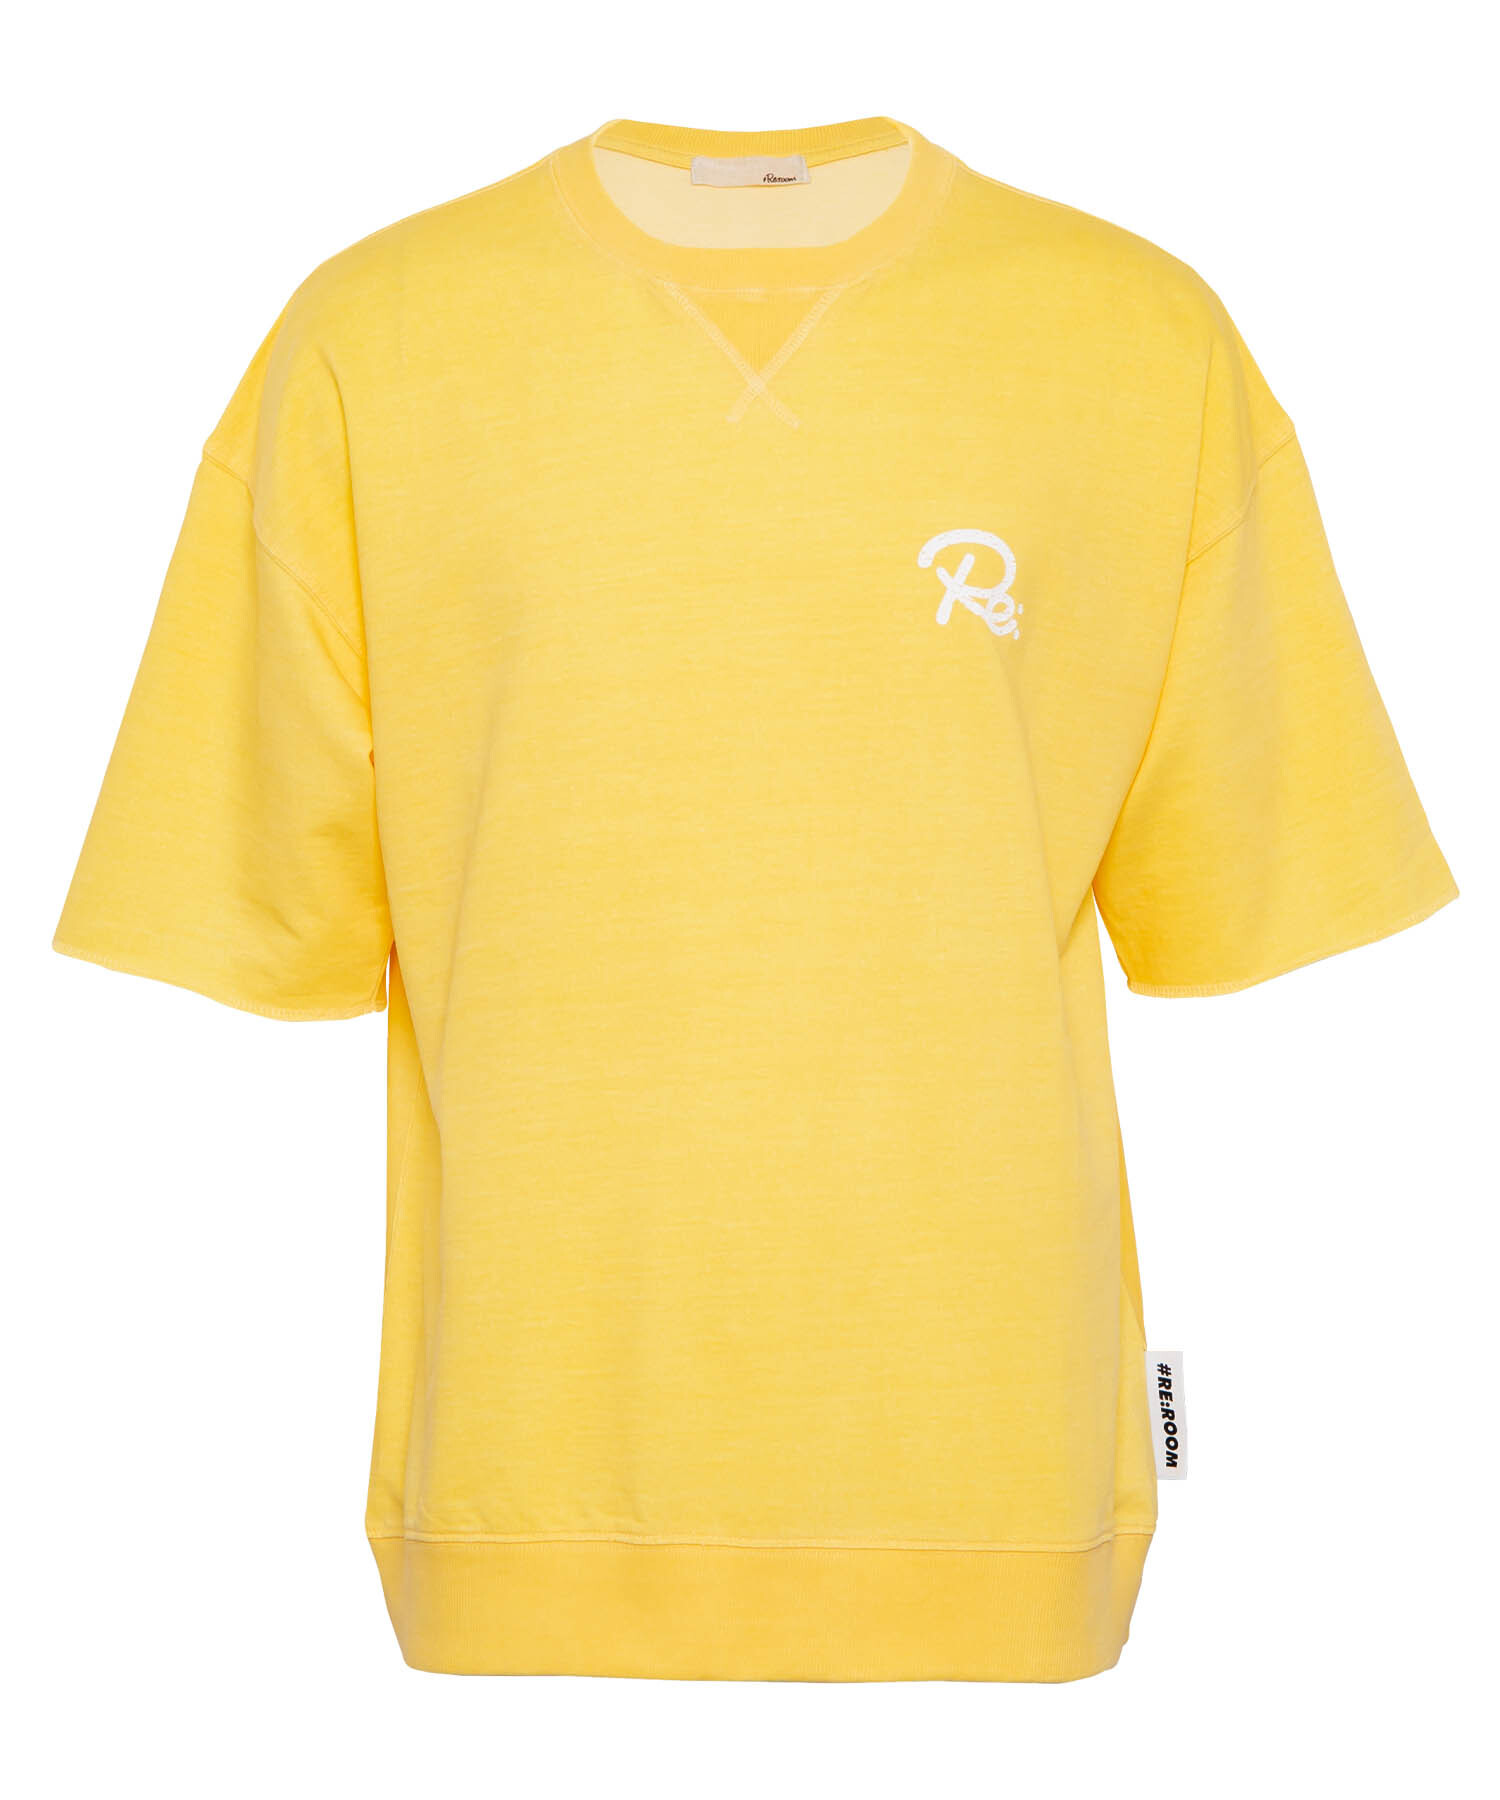 "WASHED VINTAGE SWEAT BIG T-shirt ""Re""[REC383]"